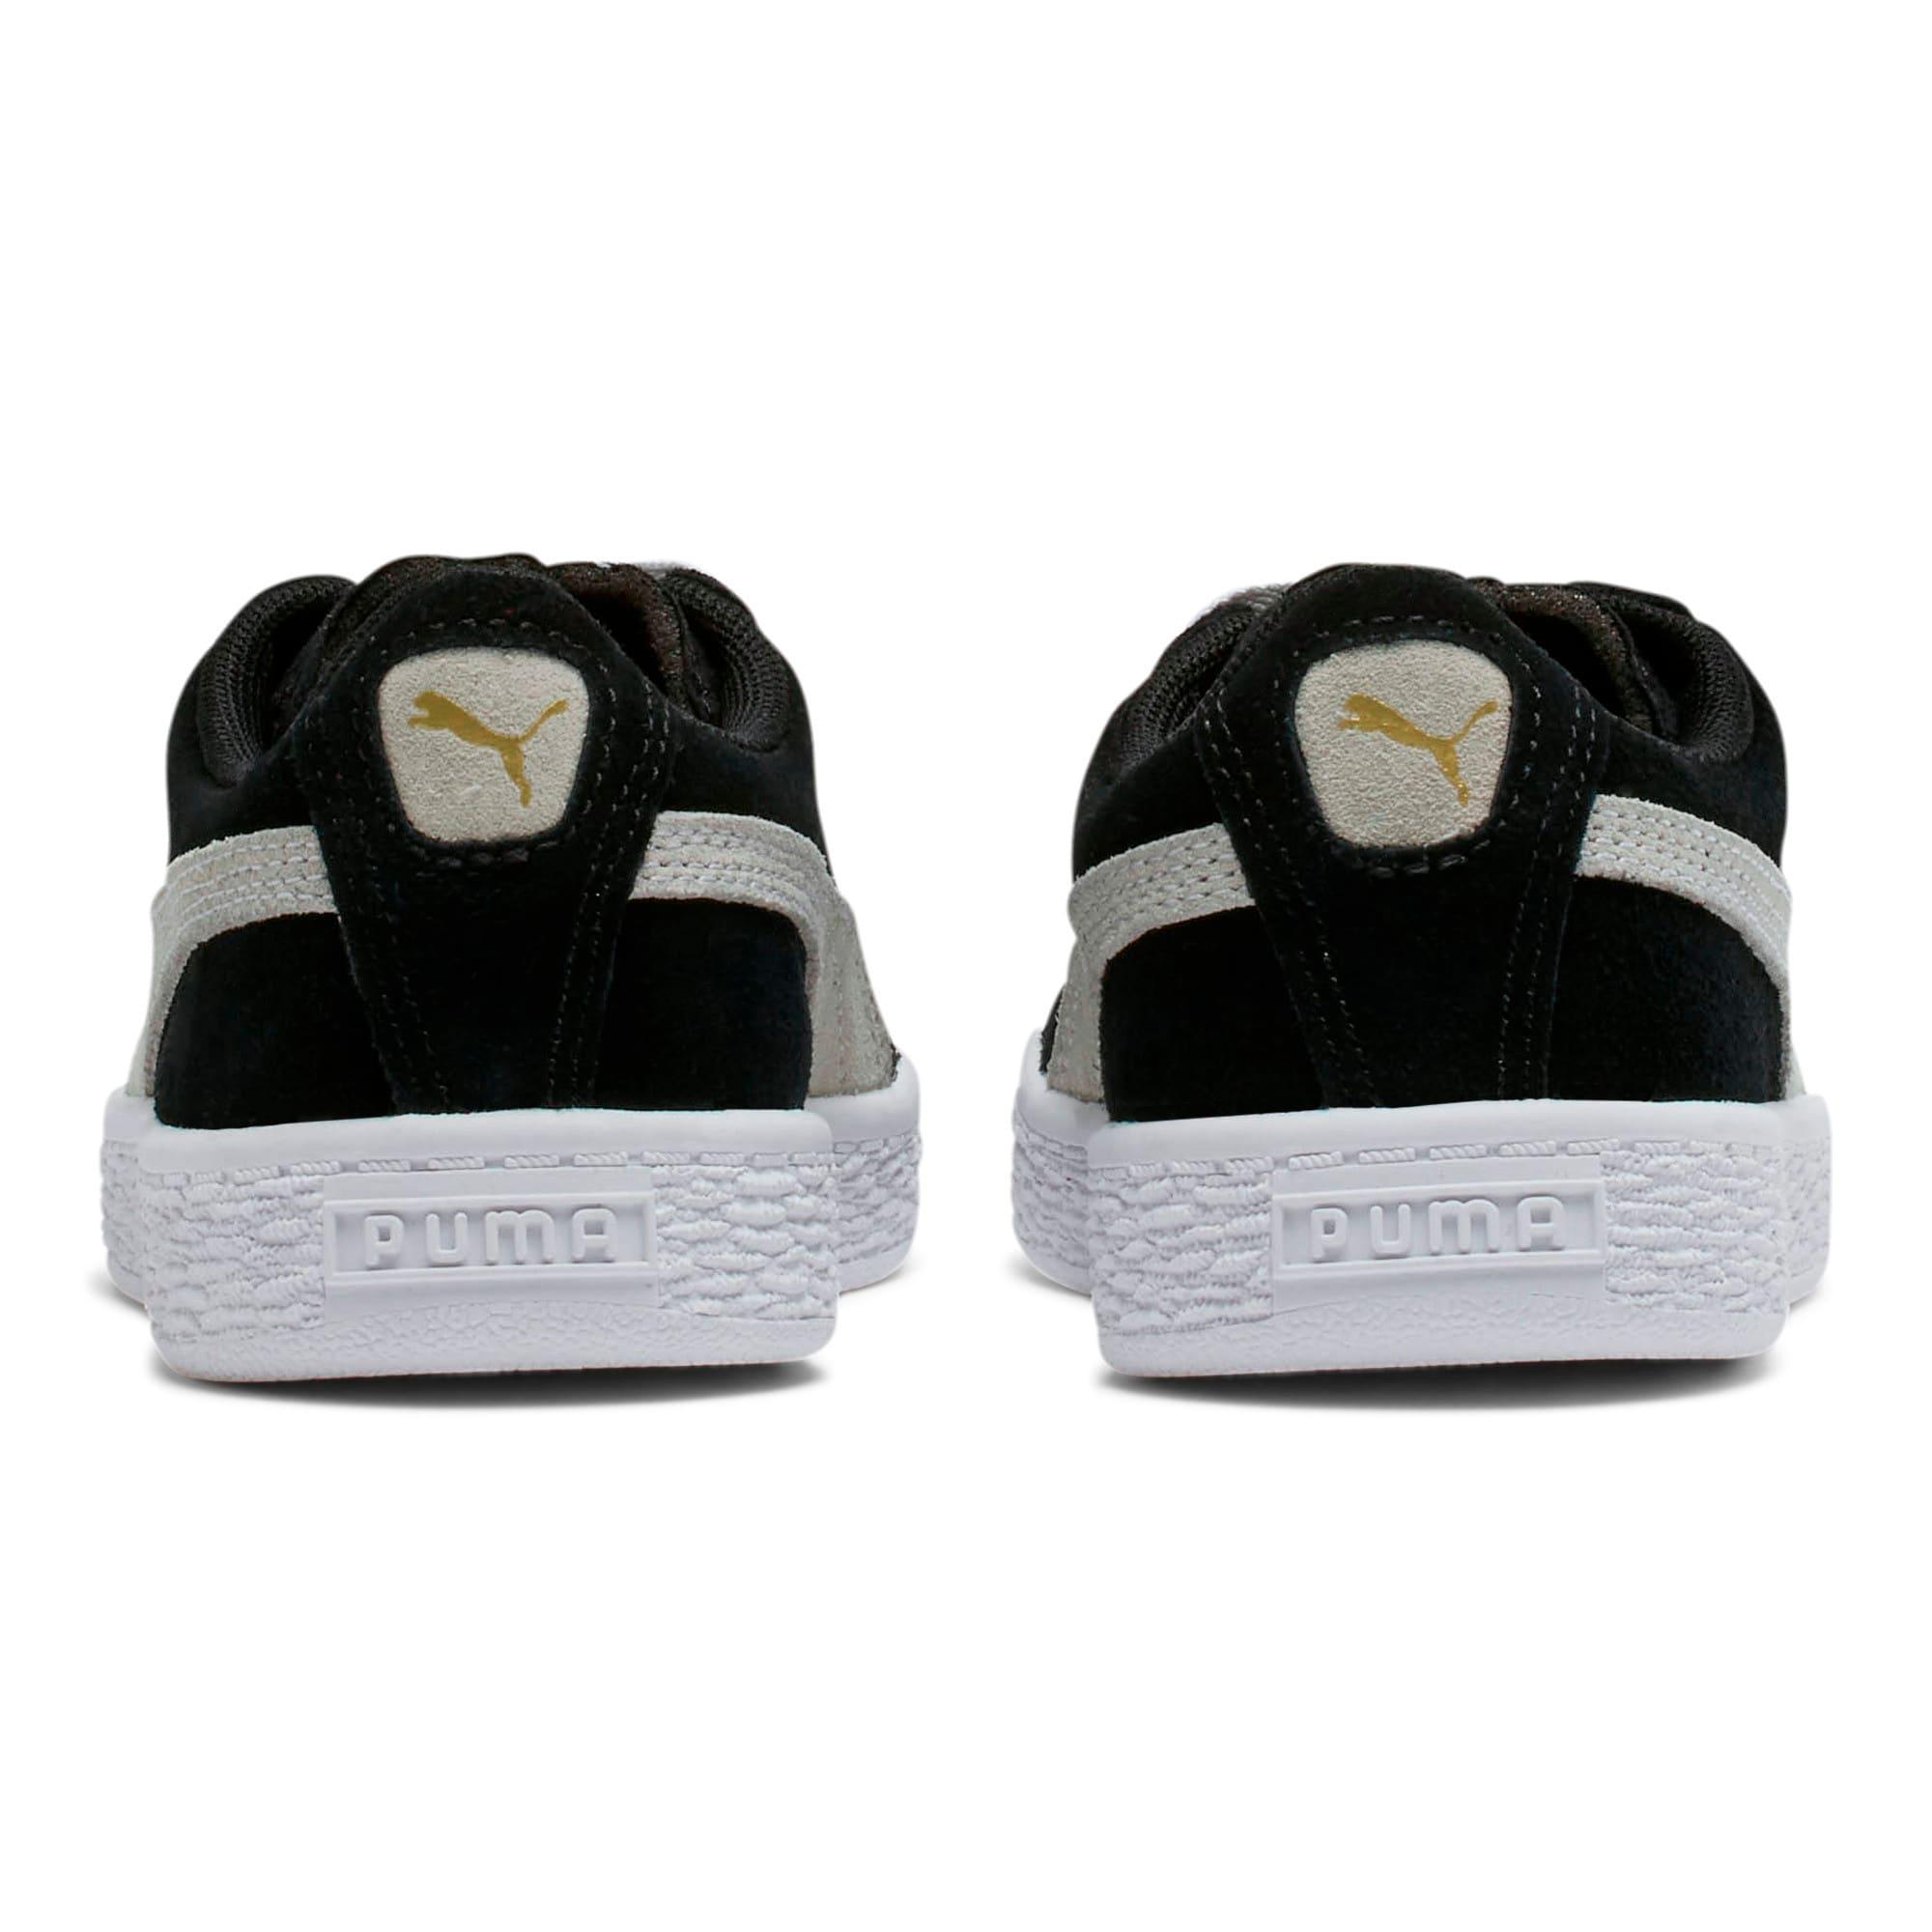 Thumbnail 4 of Suede Little Kids' Shoes, Puma Black-Puma White, medium